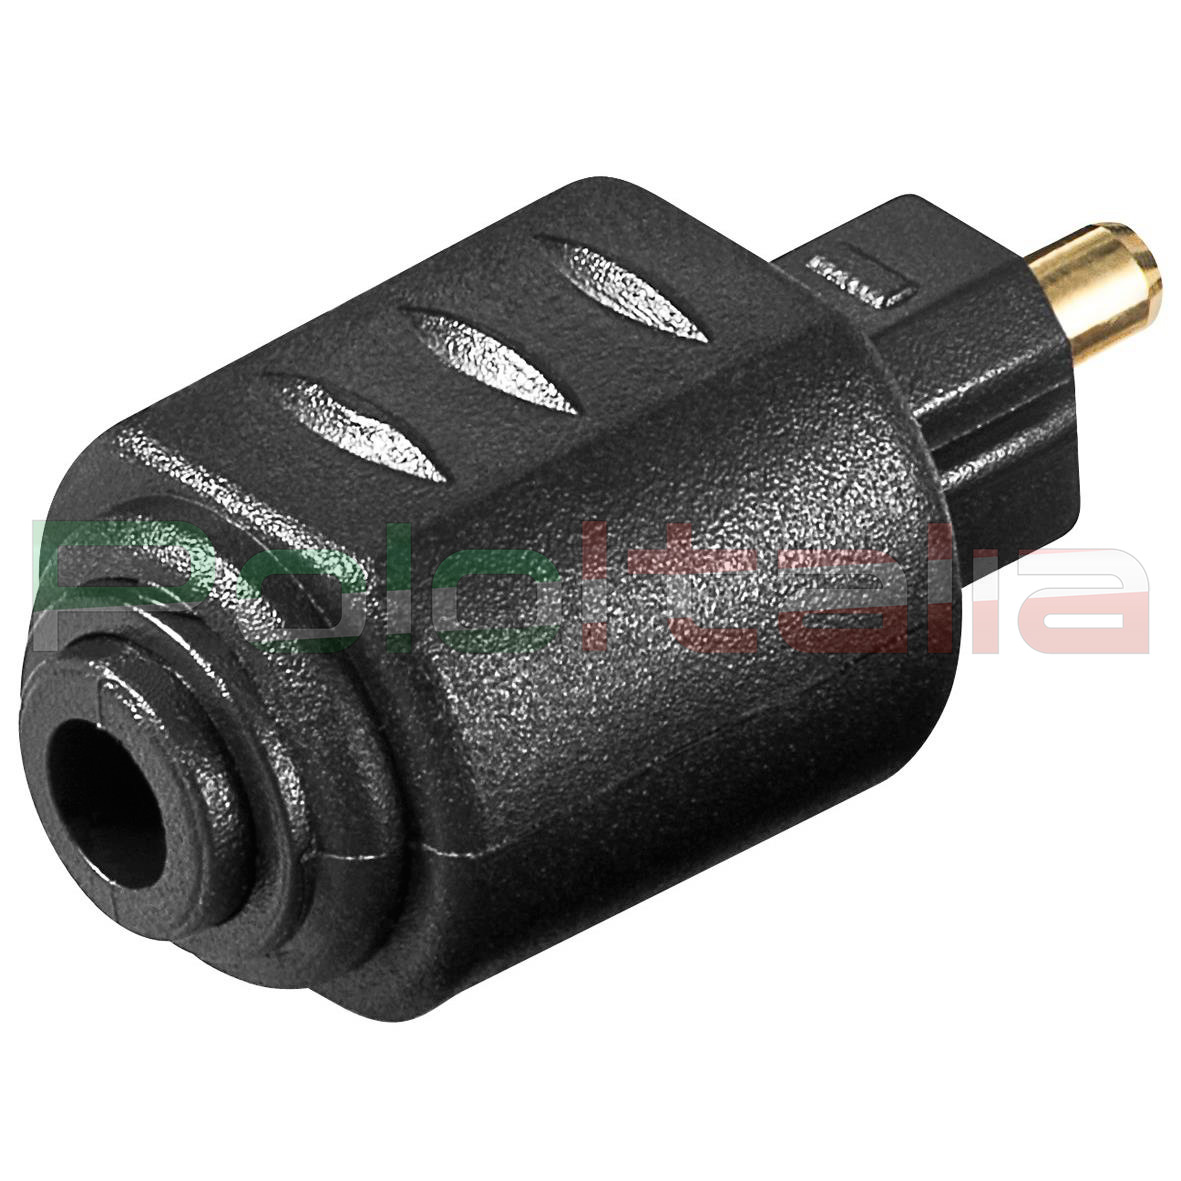 Adattatore audio ottico MXECO da 3,5 mm Jack femmina a Toslink digitale Spina maschio da 3,5 mm femmina Toslink